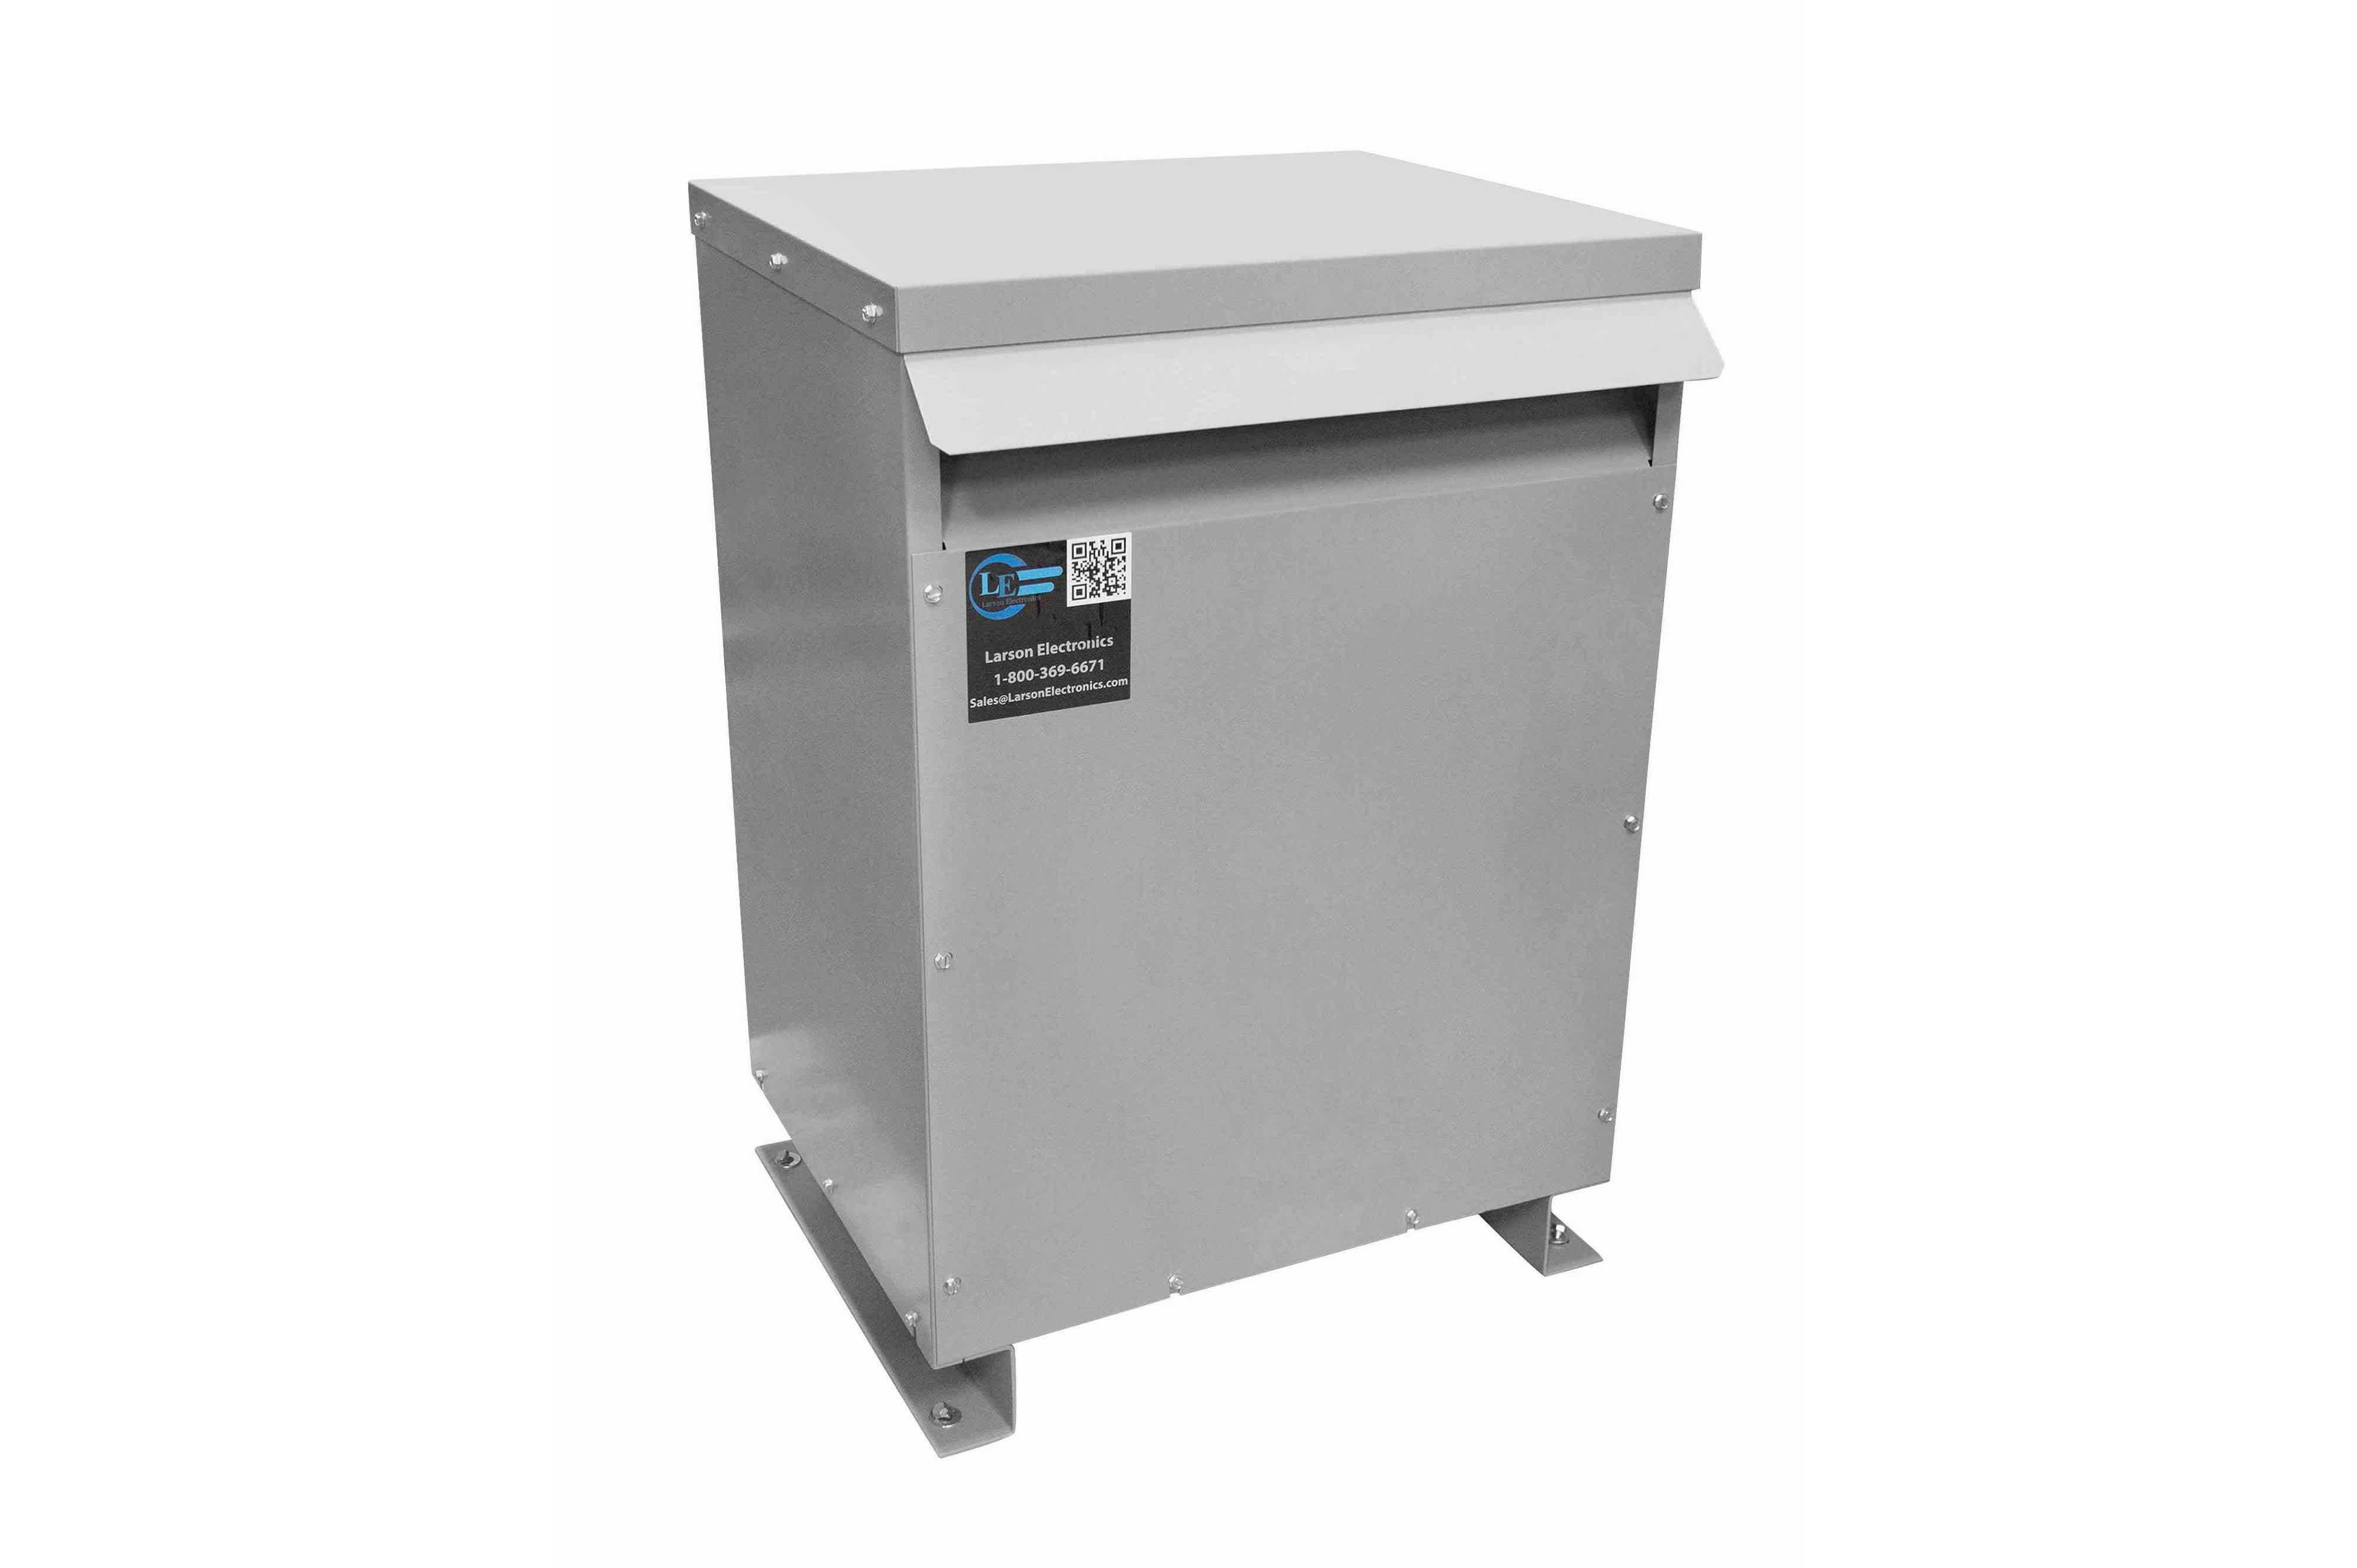 37.5 kVA 3PH Isolation Transformer, 240V Wye Primary, 480Y/277 Wye-N Secondary, N3R, Ventilated, 60 Hz